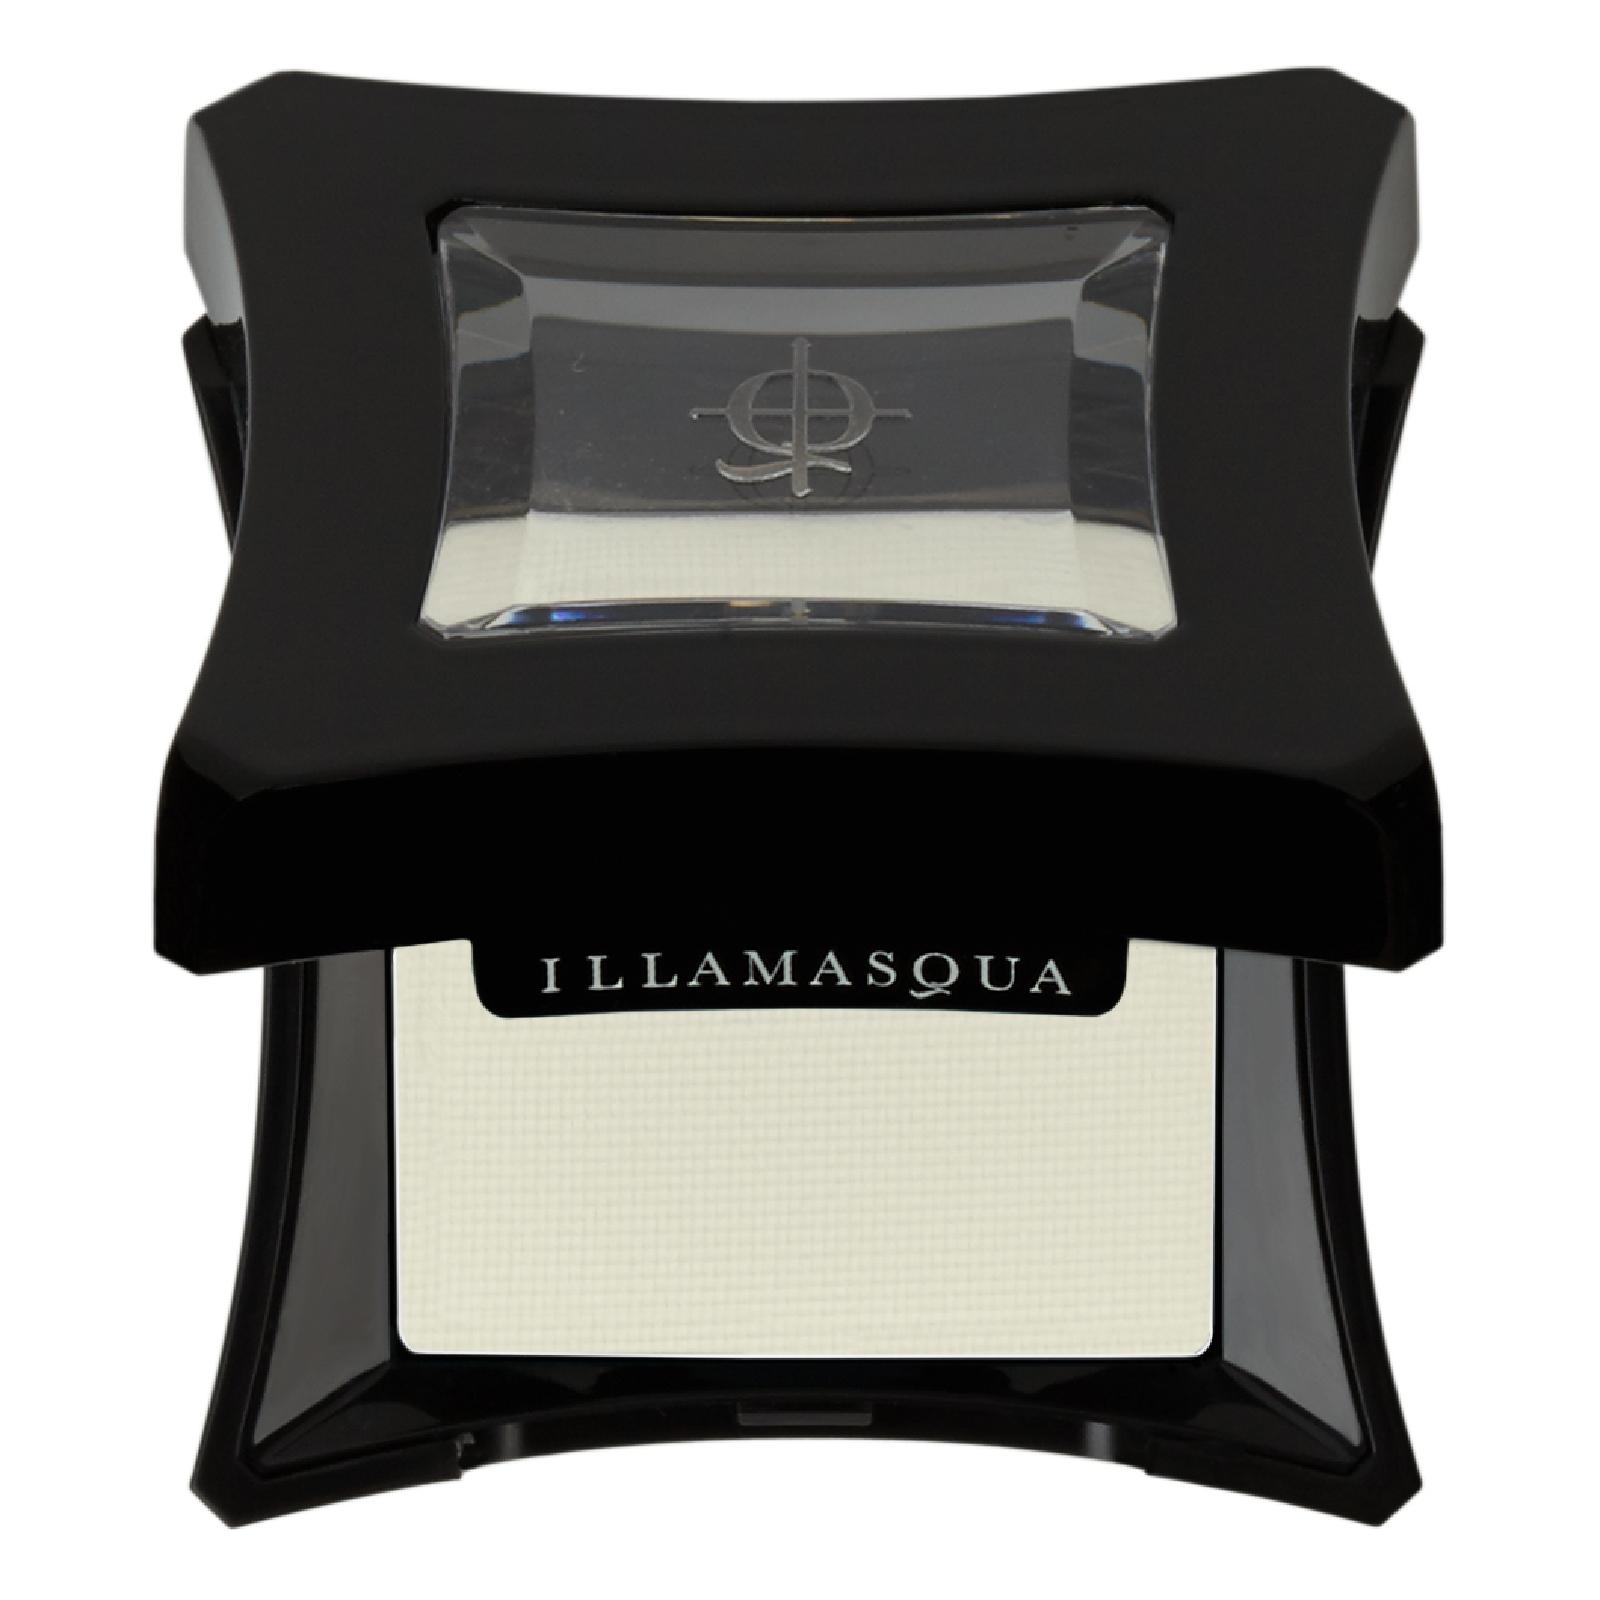 Illamasqua Powder Eye Shadow 2g (Various Shades) - Sex